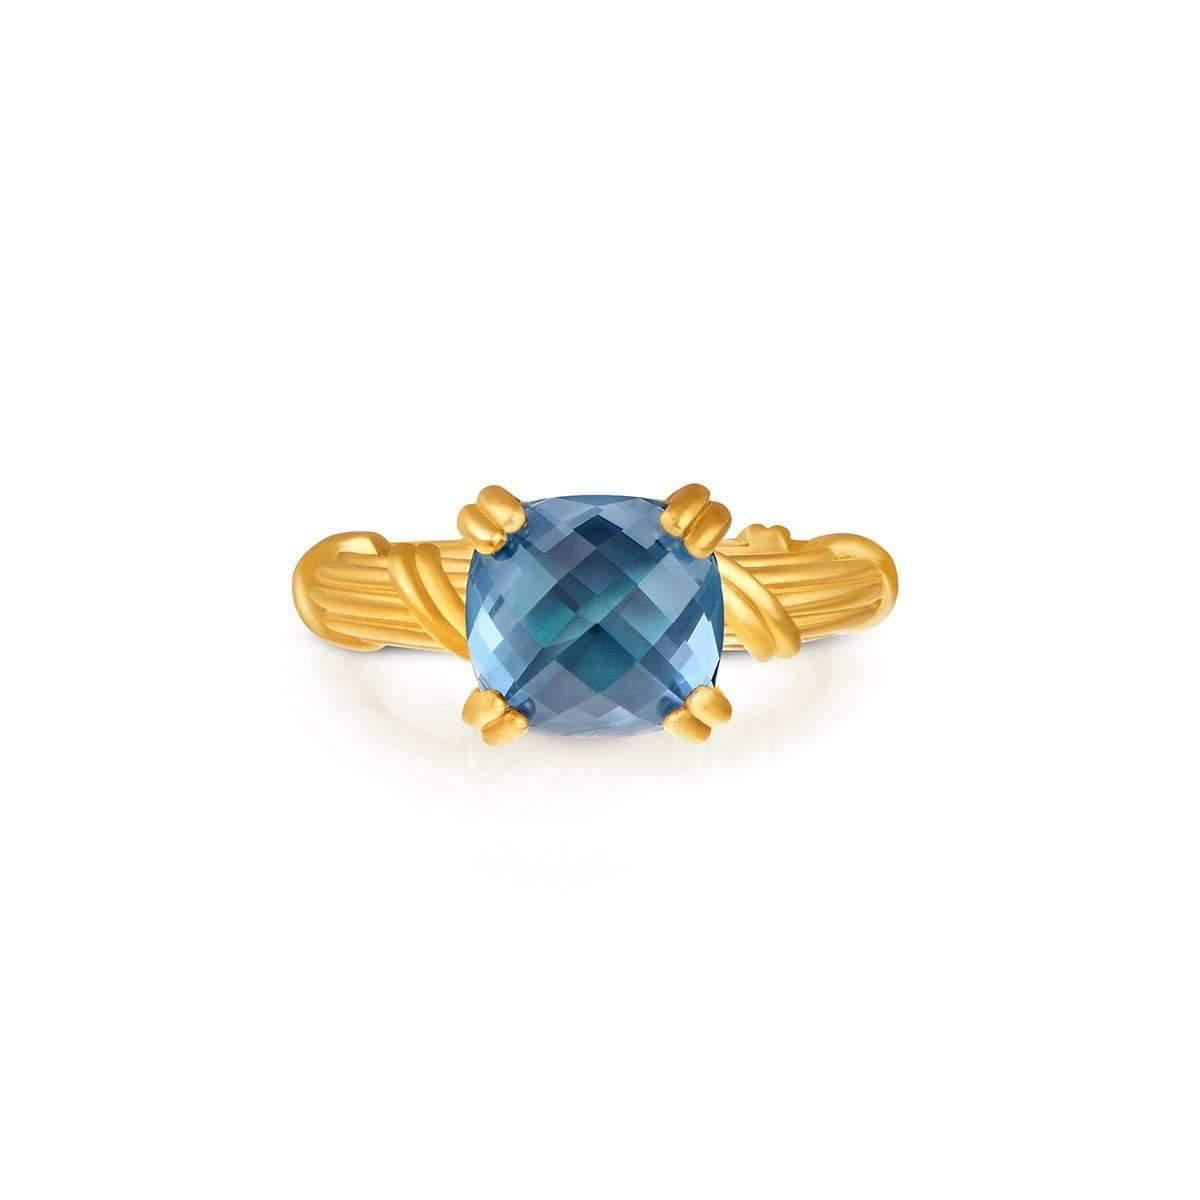 Donna Pizarro Designs 14kt London Blue Topaz And Diamond Ring - UK T 1/2 - US 10 - EU 62 1/4 jo6X47r